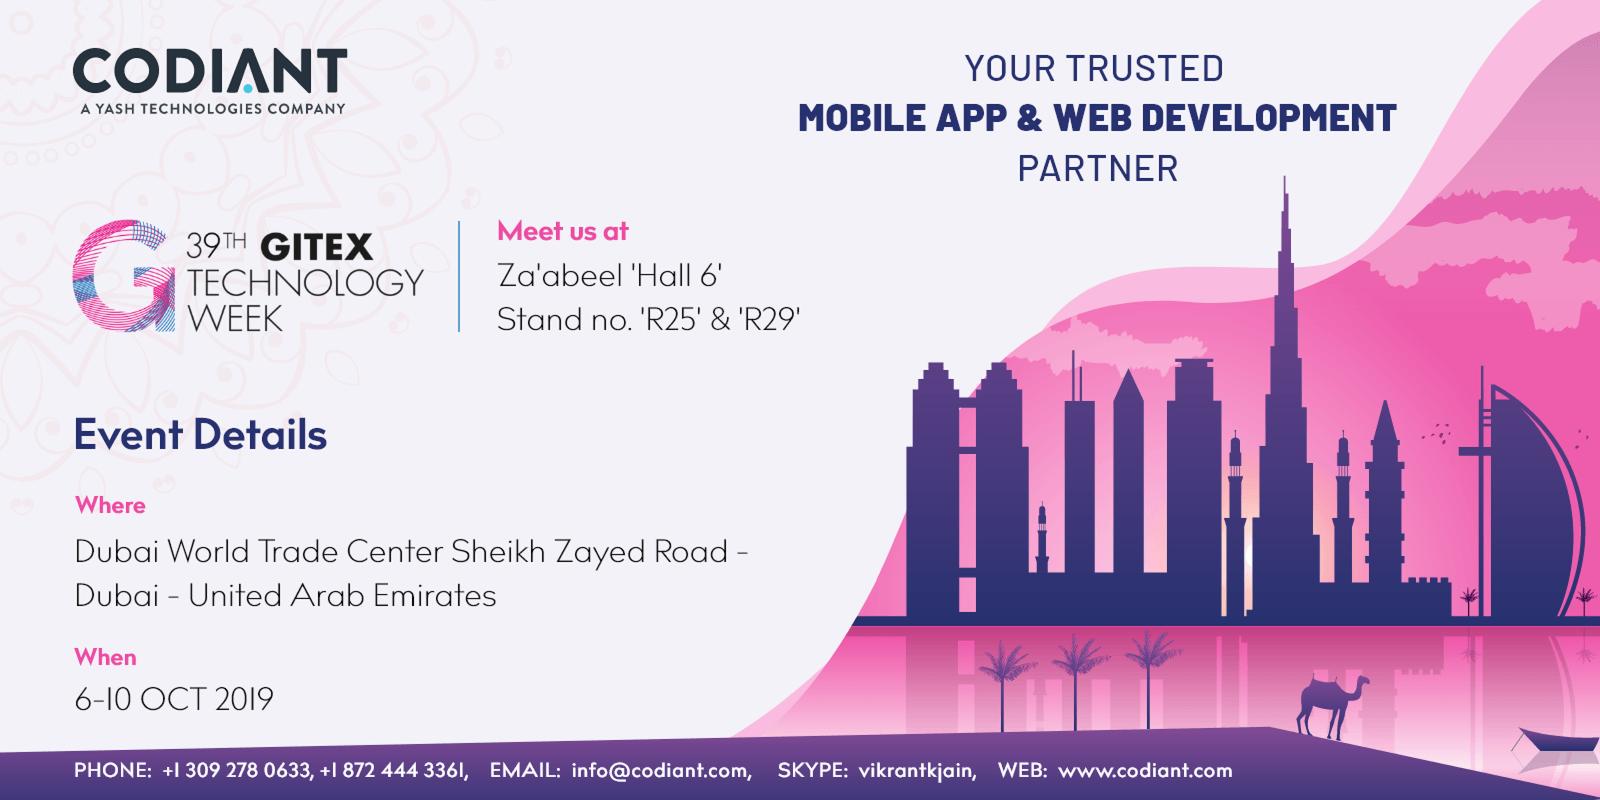 CODIANT INVITES YOU TO GITEX TECHNOLOGY WEEK DUBAI '6-10 OCT 2019